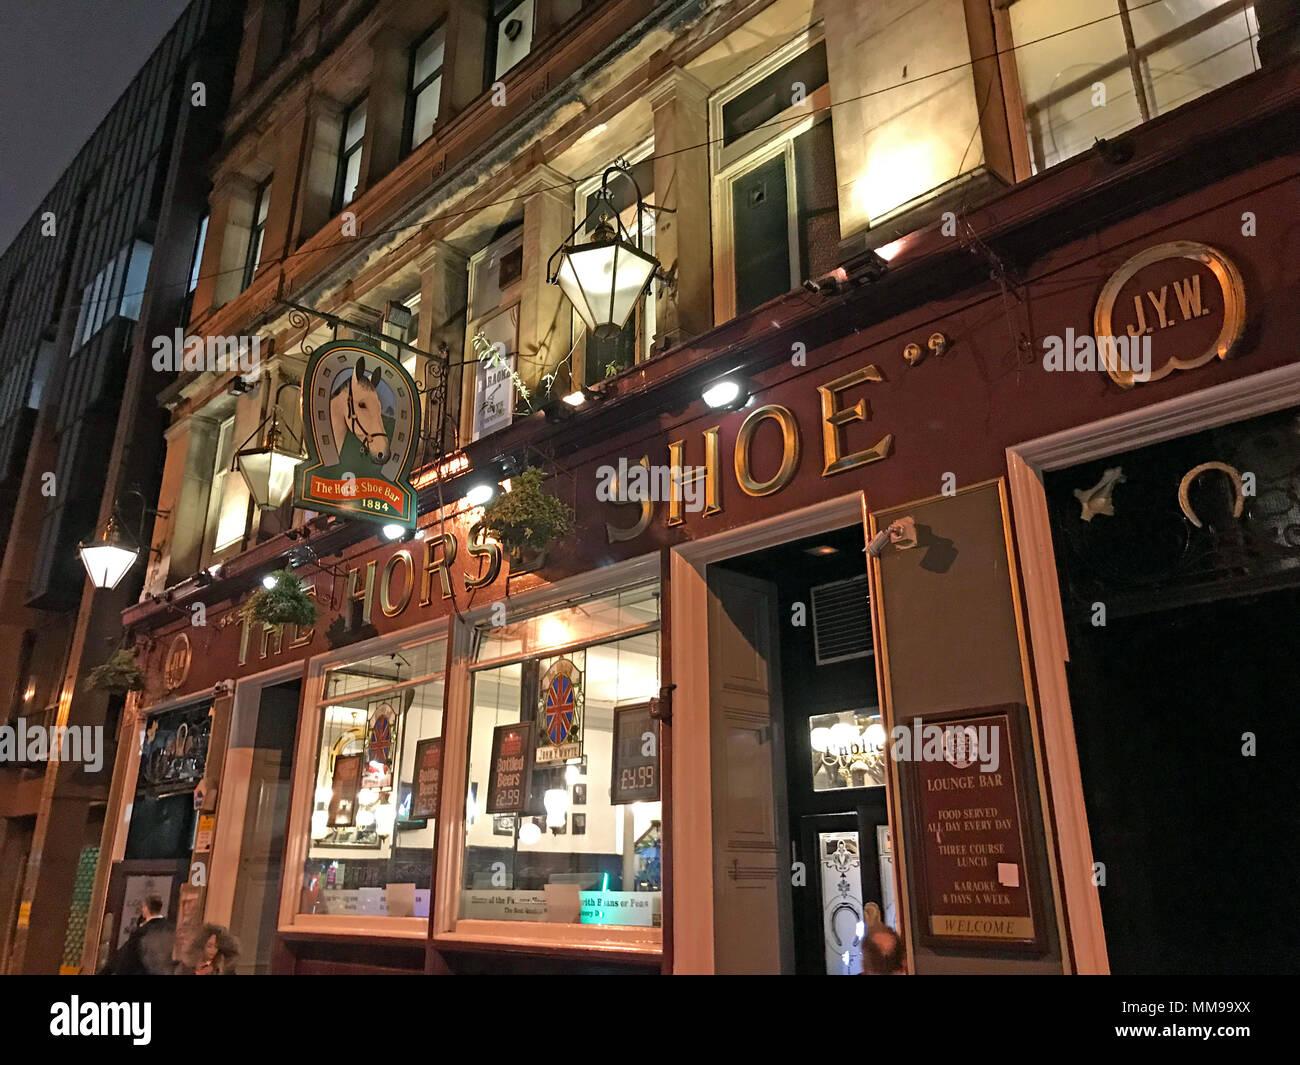 GoTonysmith,@HotpixUK,Horse,Shoe,bar,pub,Horseshoe,24 Drury St,Scotland UK,at night,at dusk,night,dusk,nighttime,night time,JYW,Drury St,city,city centre,drinking,pubs,bars,Scotland,long bar,104 feet,grand,watering hole,Victorian pub,Victorian bar,historic Victorian pub,history,City Centre Pub,central Glasgow,Glasgow Central,Glasgow City Centre,tourist,tourism,outside,exterior